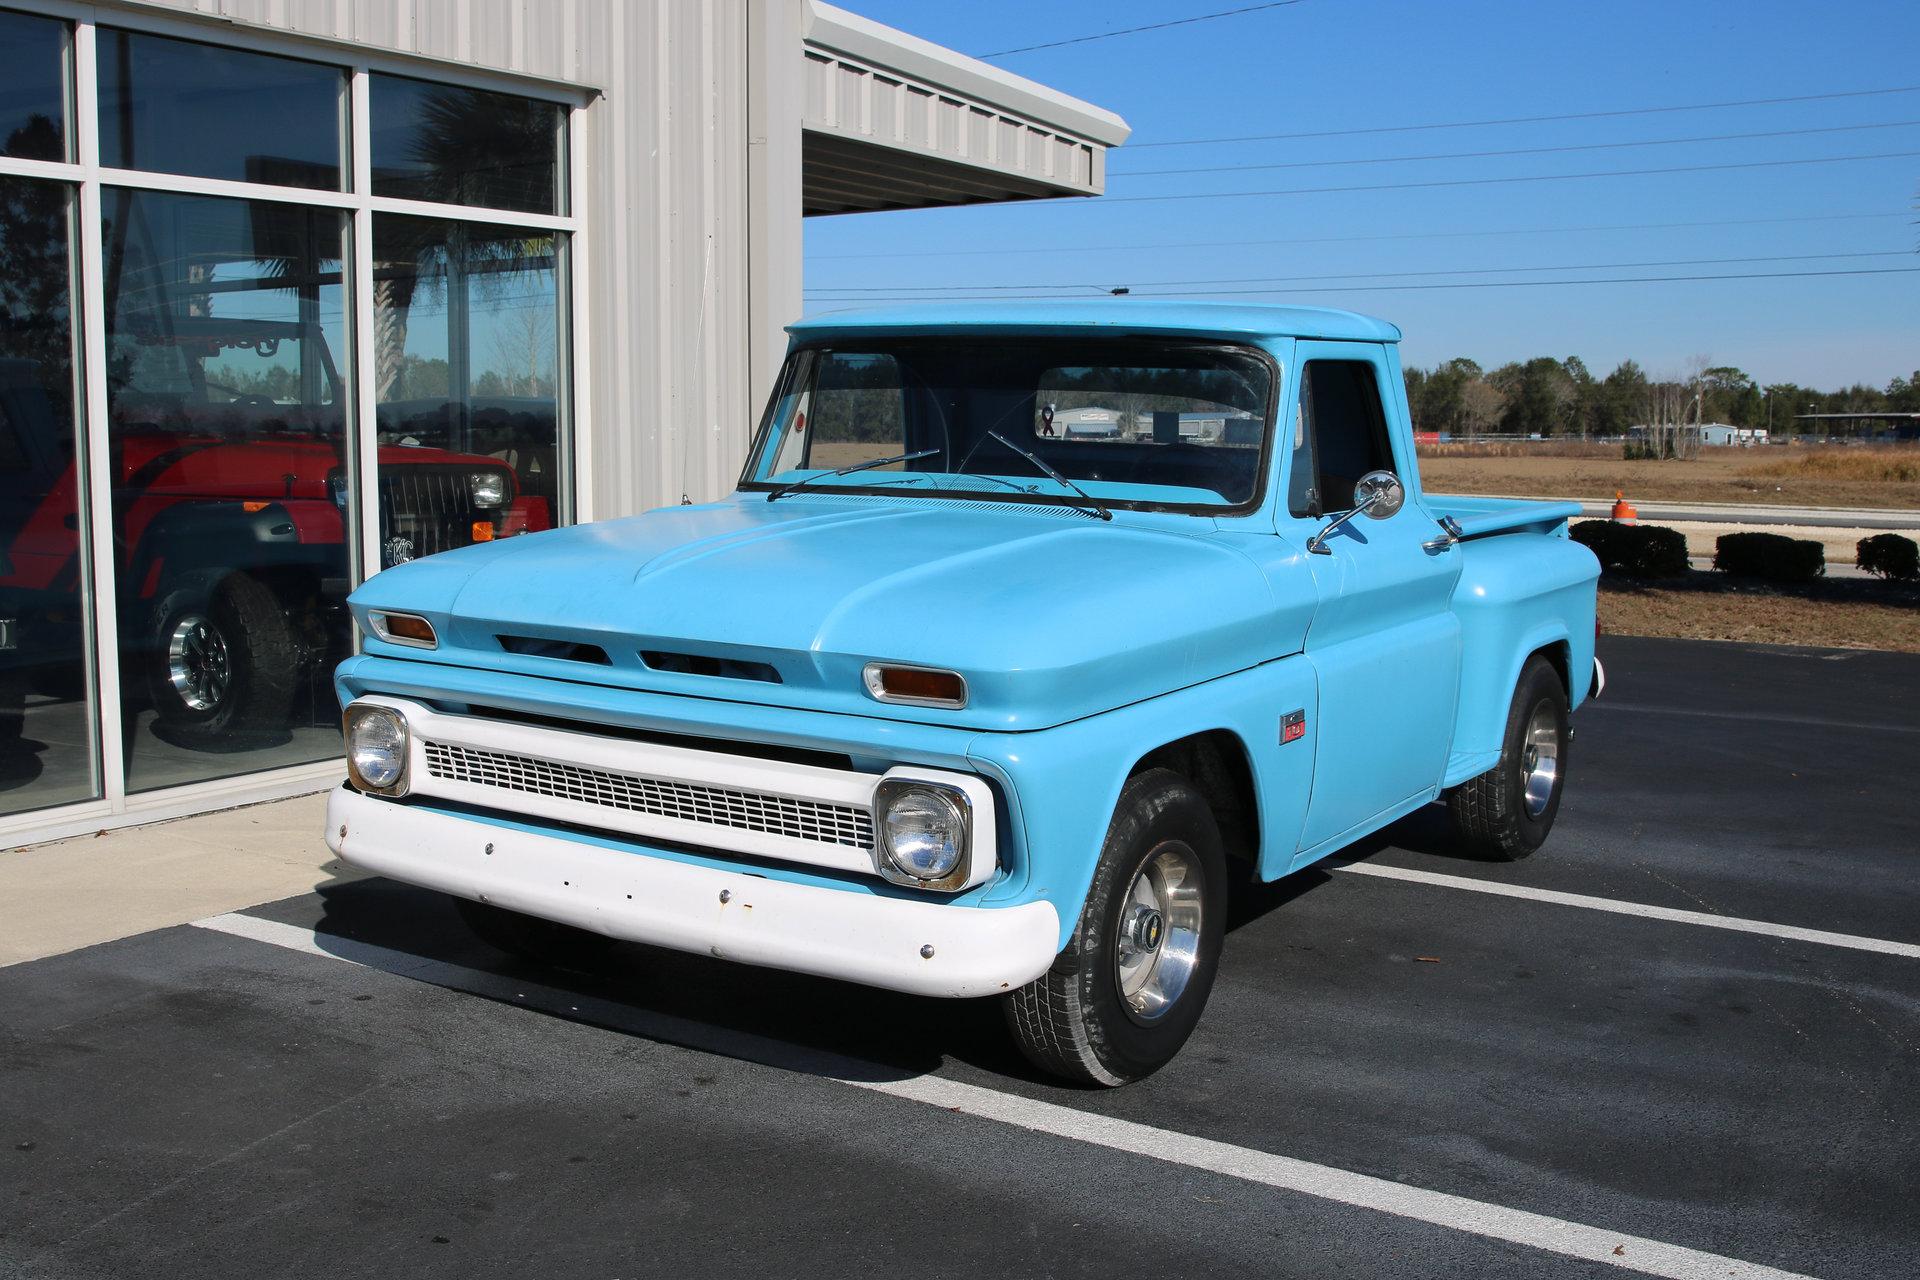 1966 Chevrolet 1500 Burnyzz American Classic Horse Power Pickup Truck